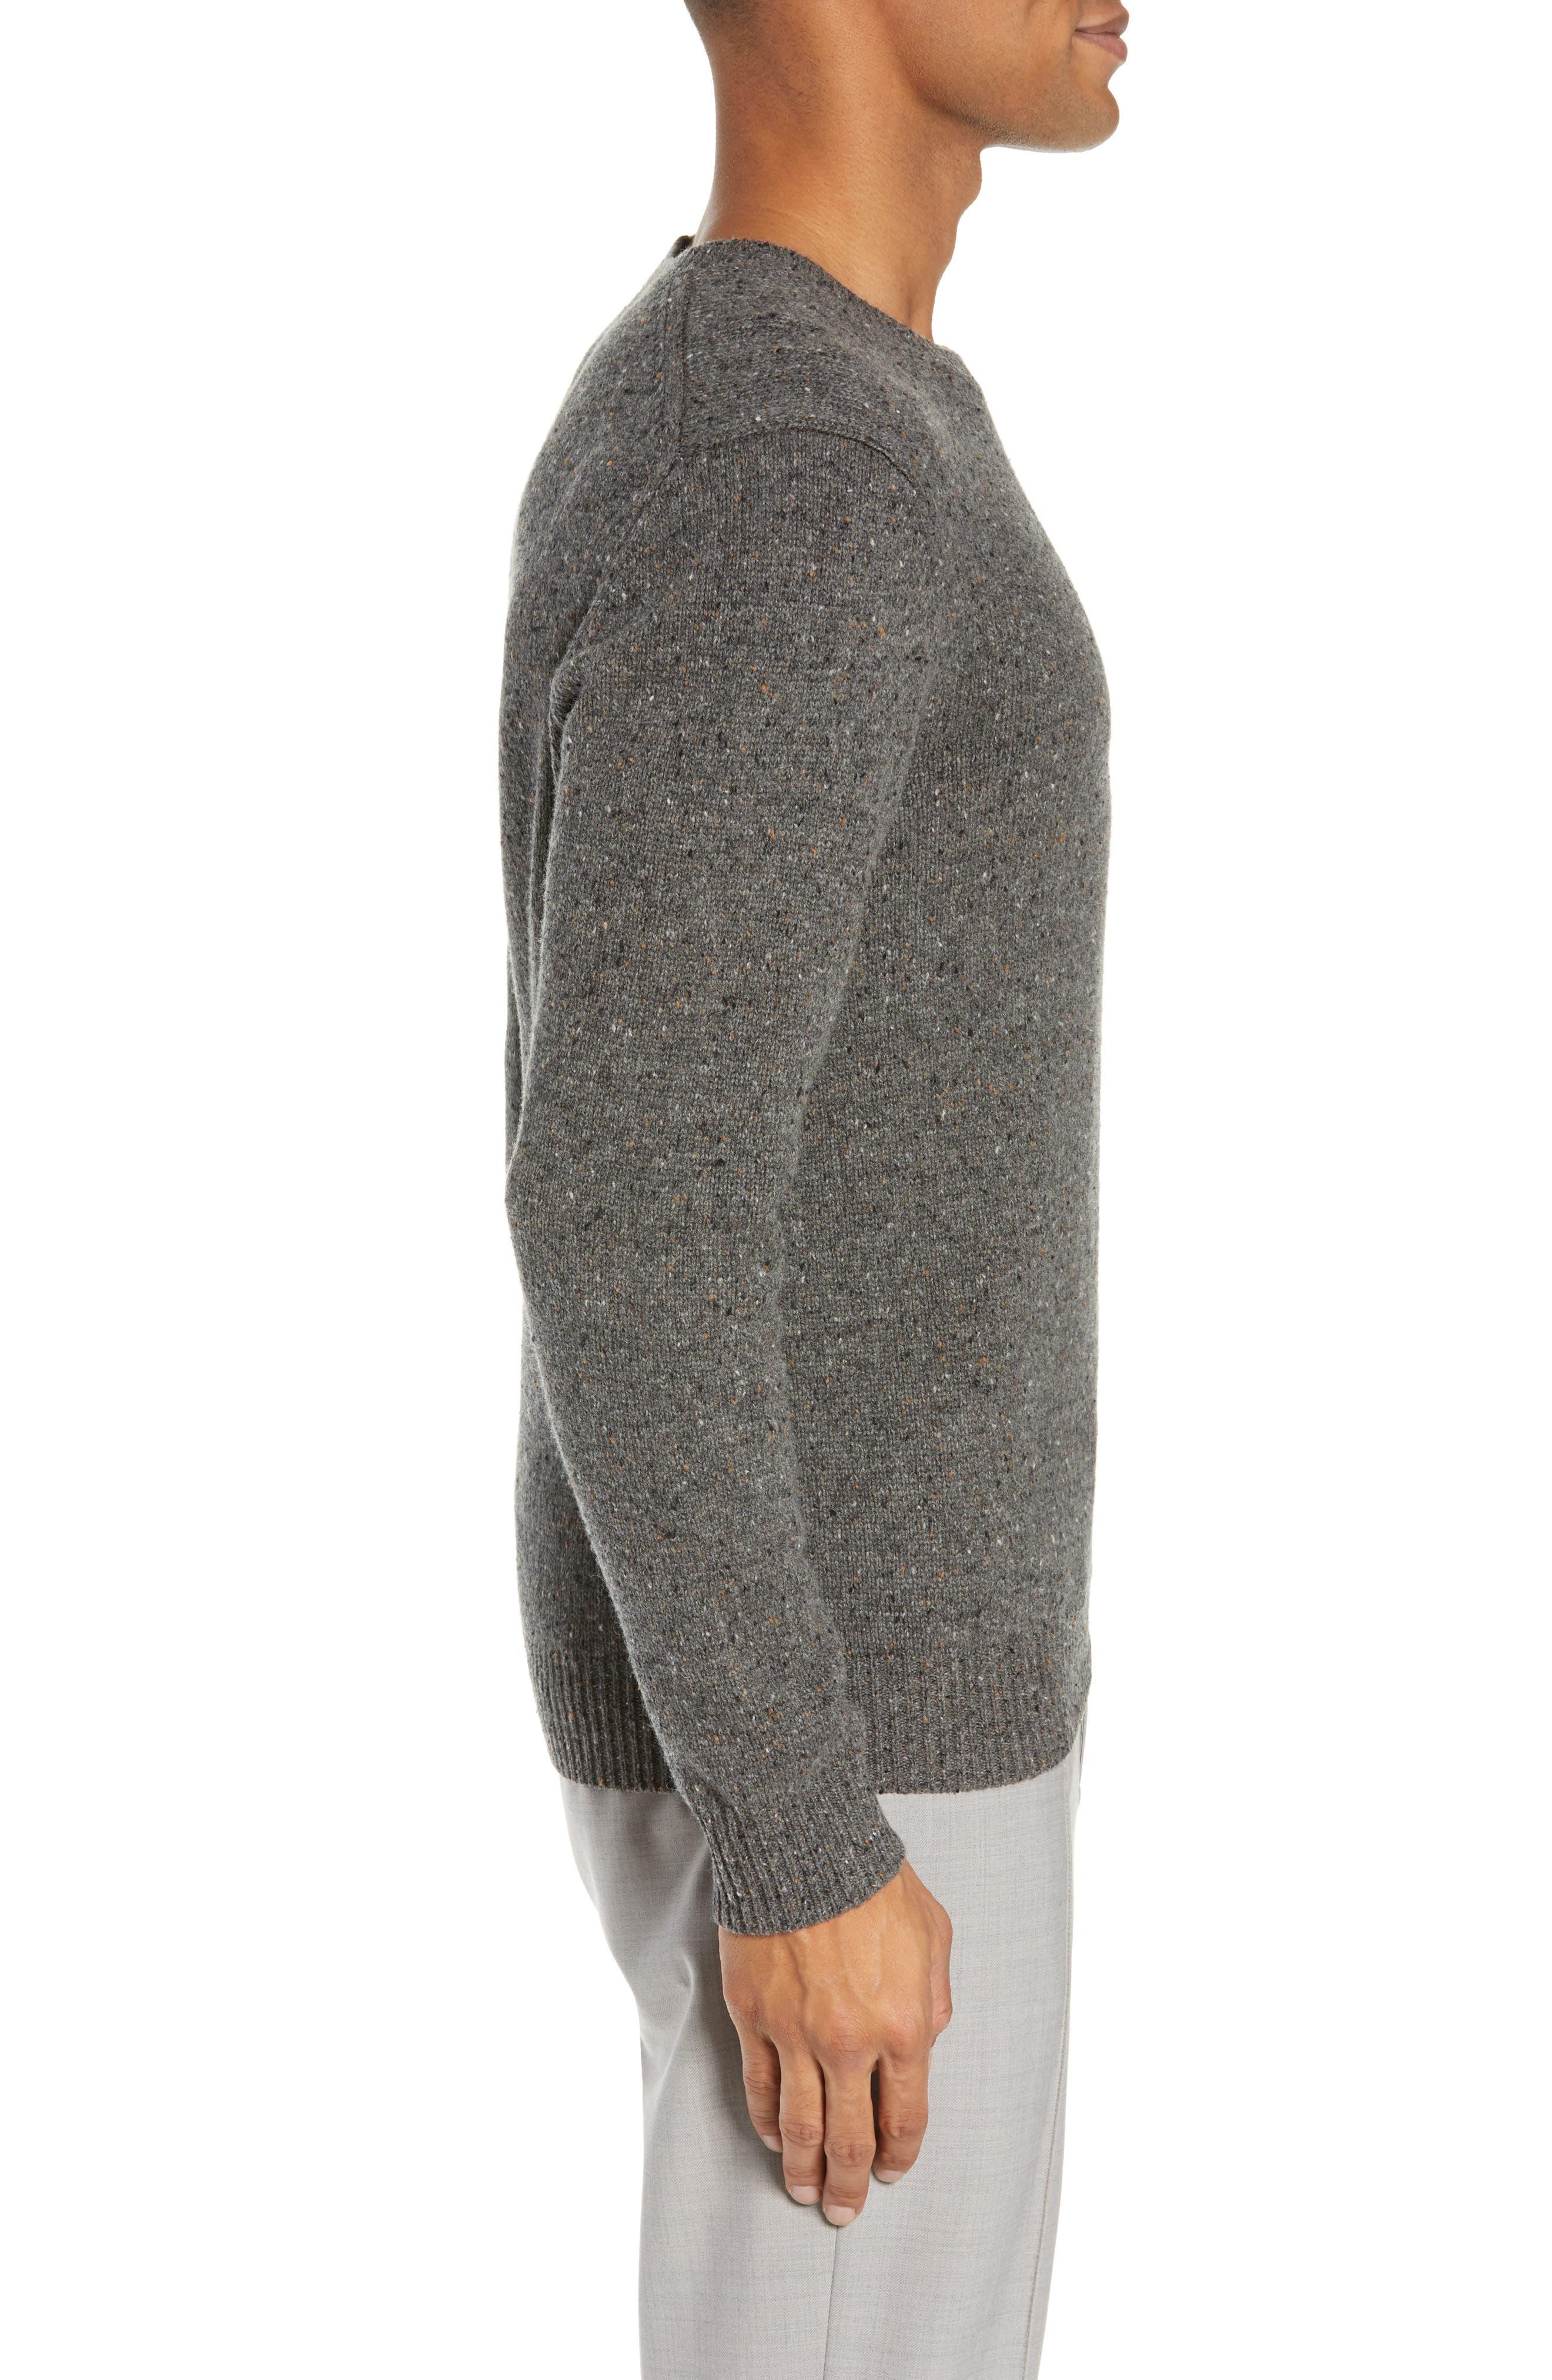 Jaxon Trim Fit Wool Sweater,                             Alternate thumbnail 3, color,                             GREY MULTI